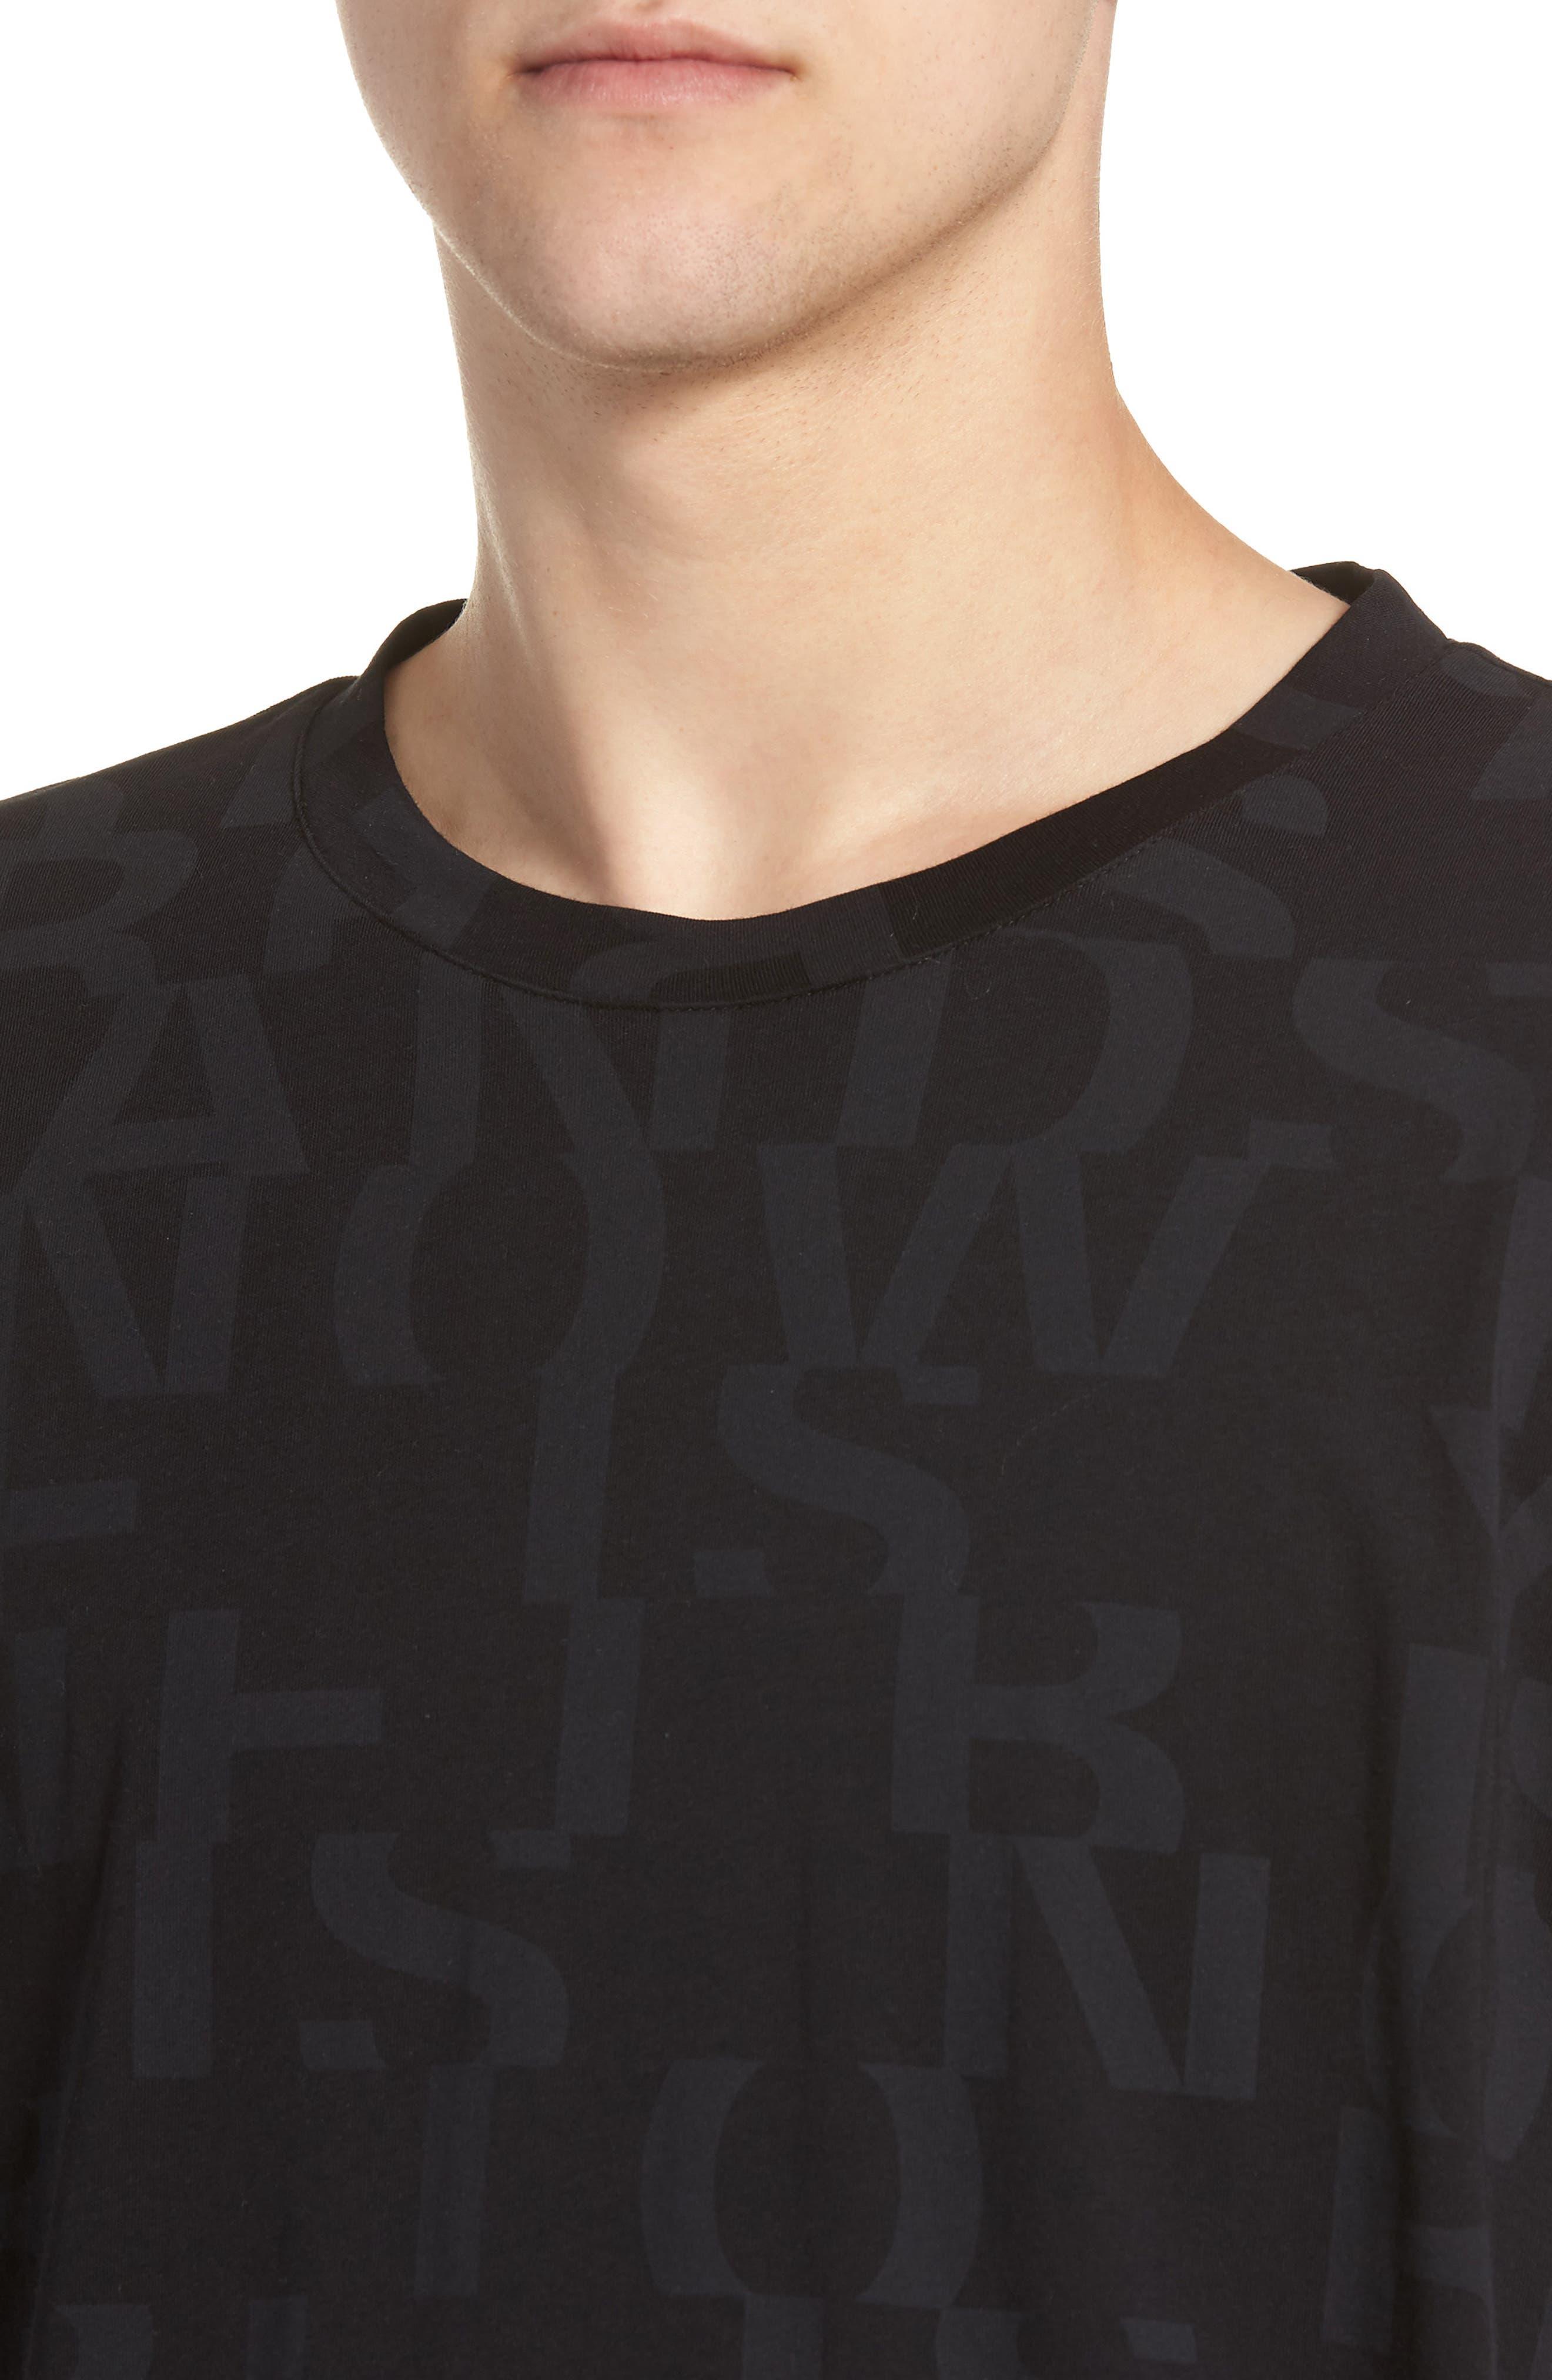 Dyrics Letter Graphic T-Shirt,                             Alternate thumbnail 4, color,                             BLACK